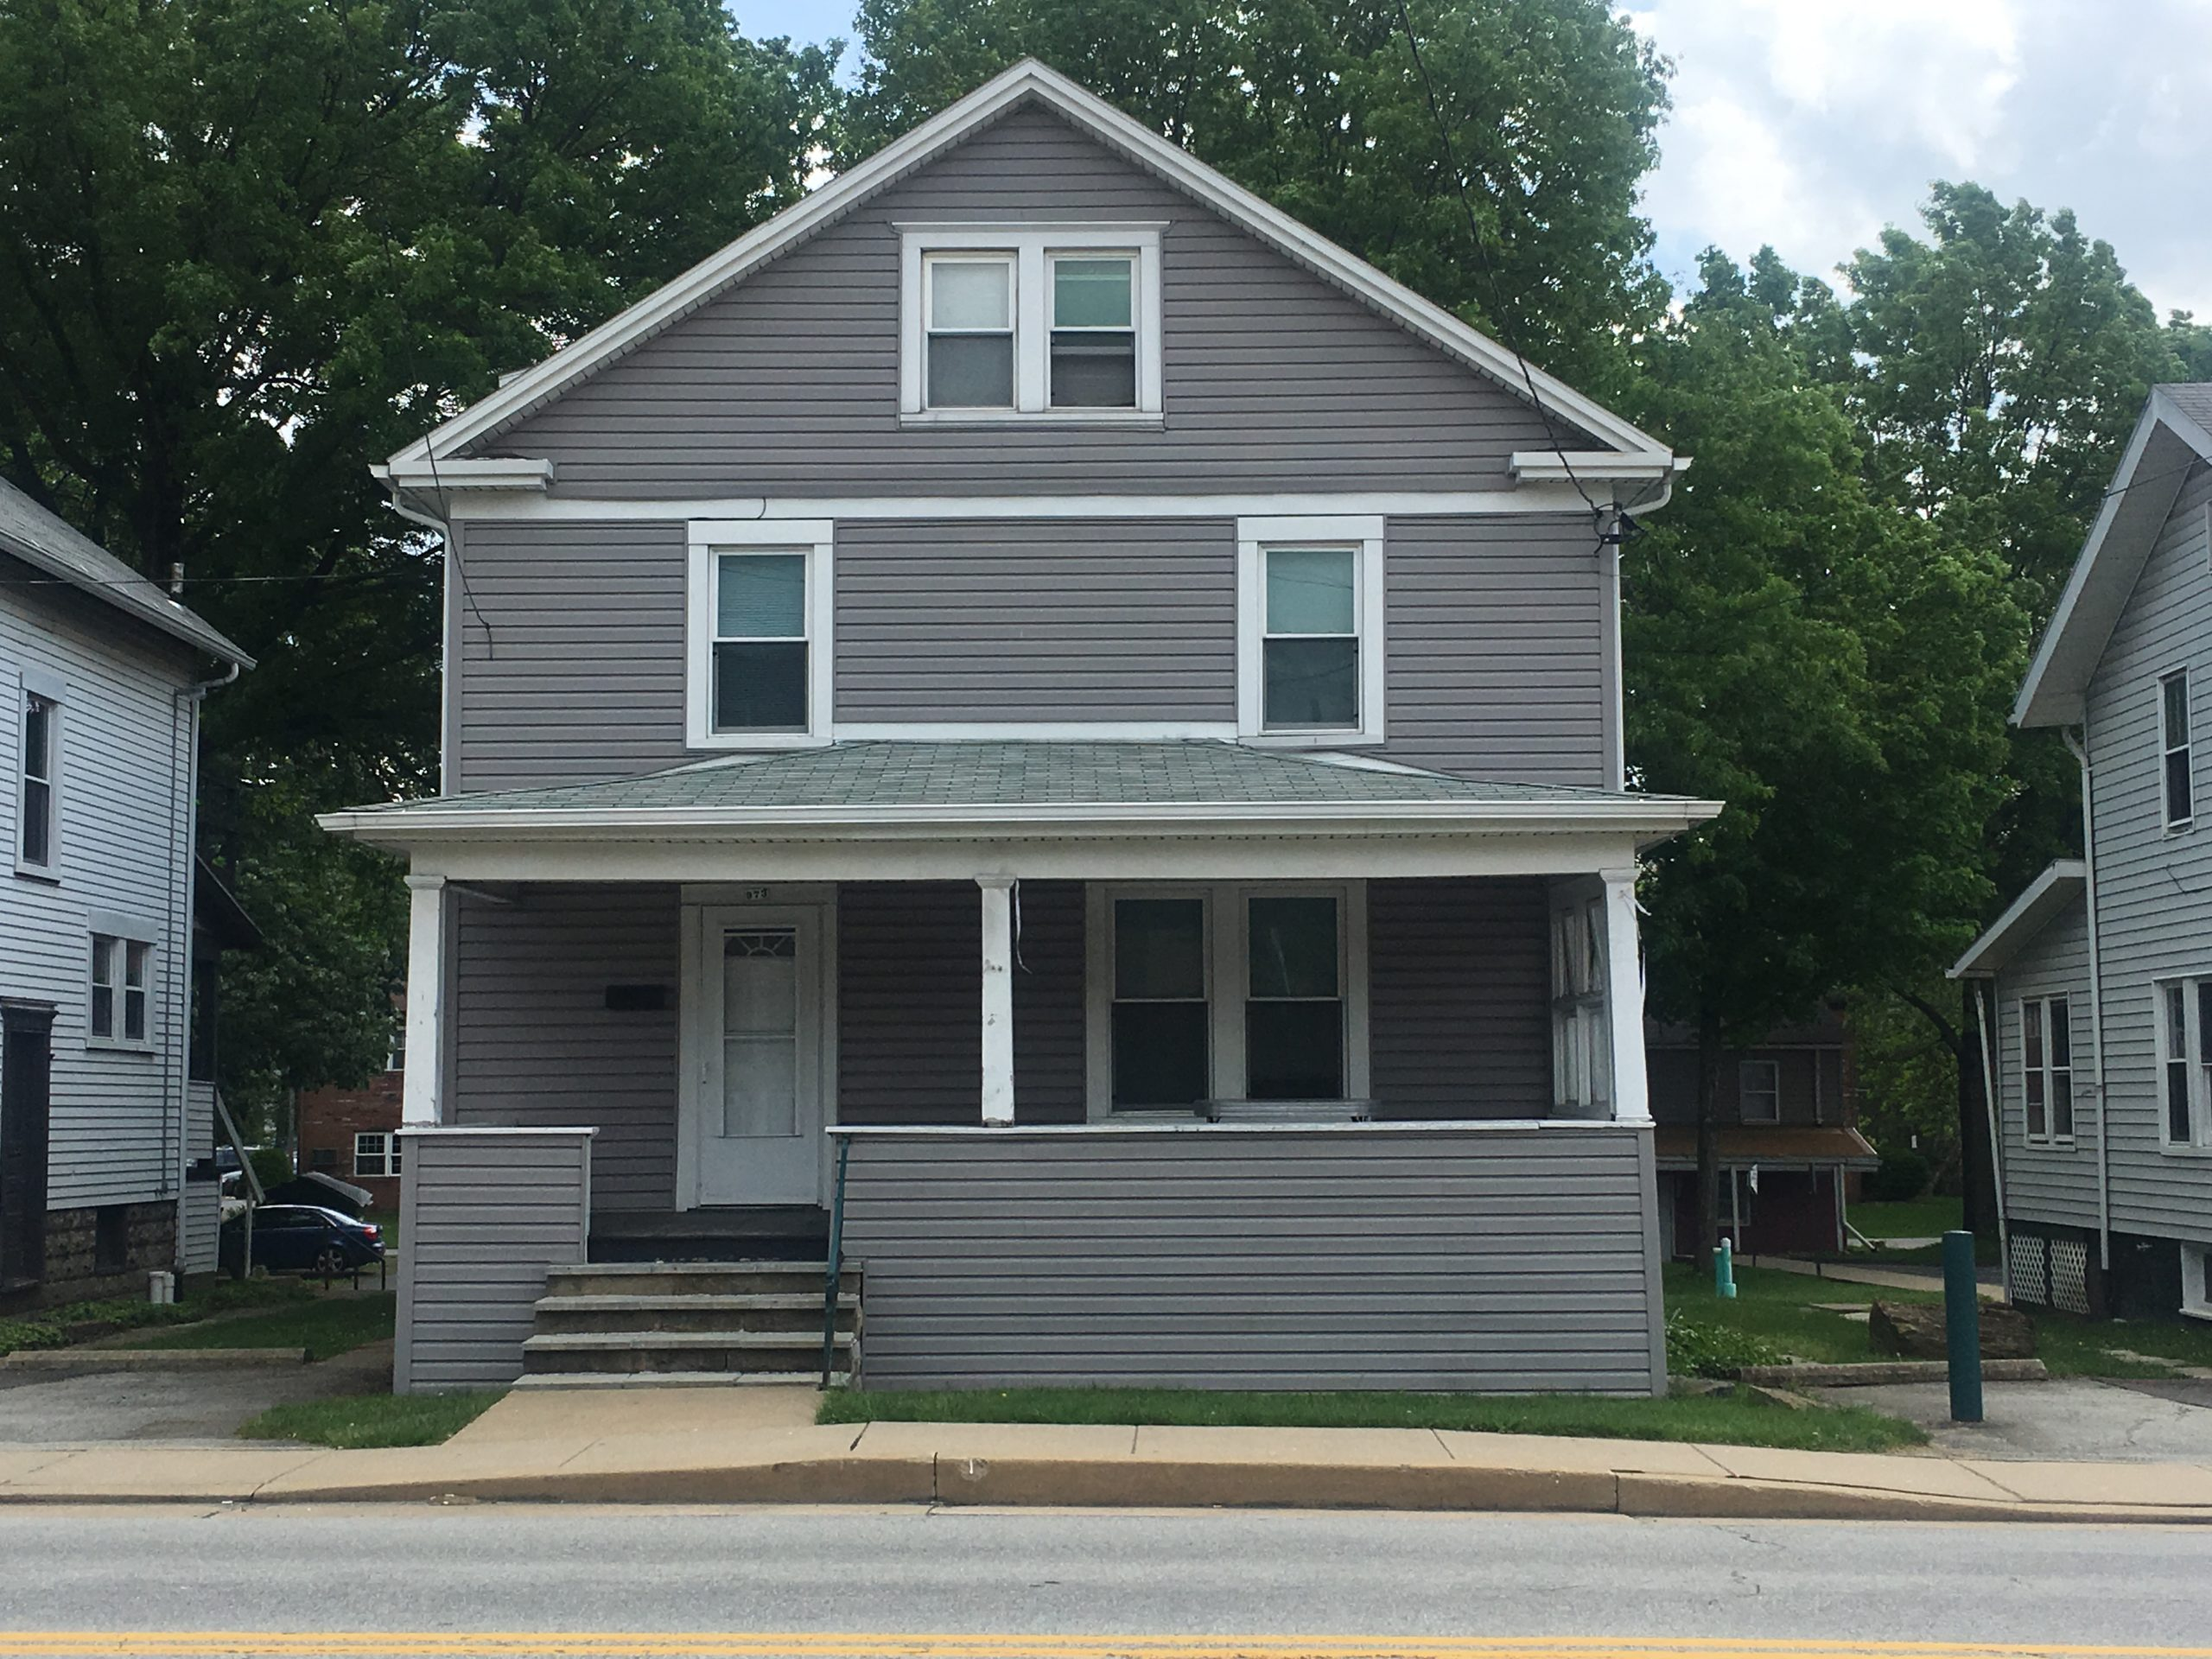 IUP Off Campus Student Housing 973 Wayne Avenue Indiana PA 15701